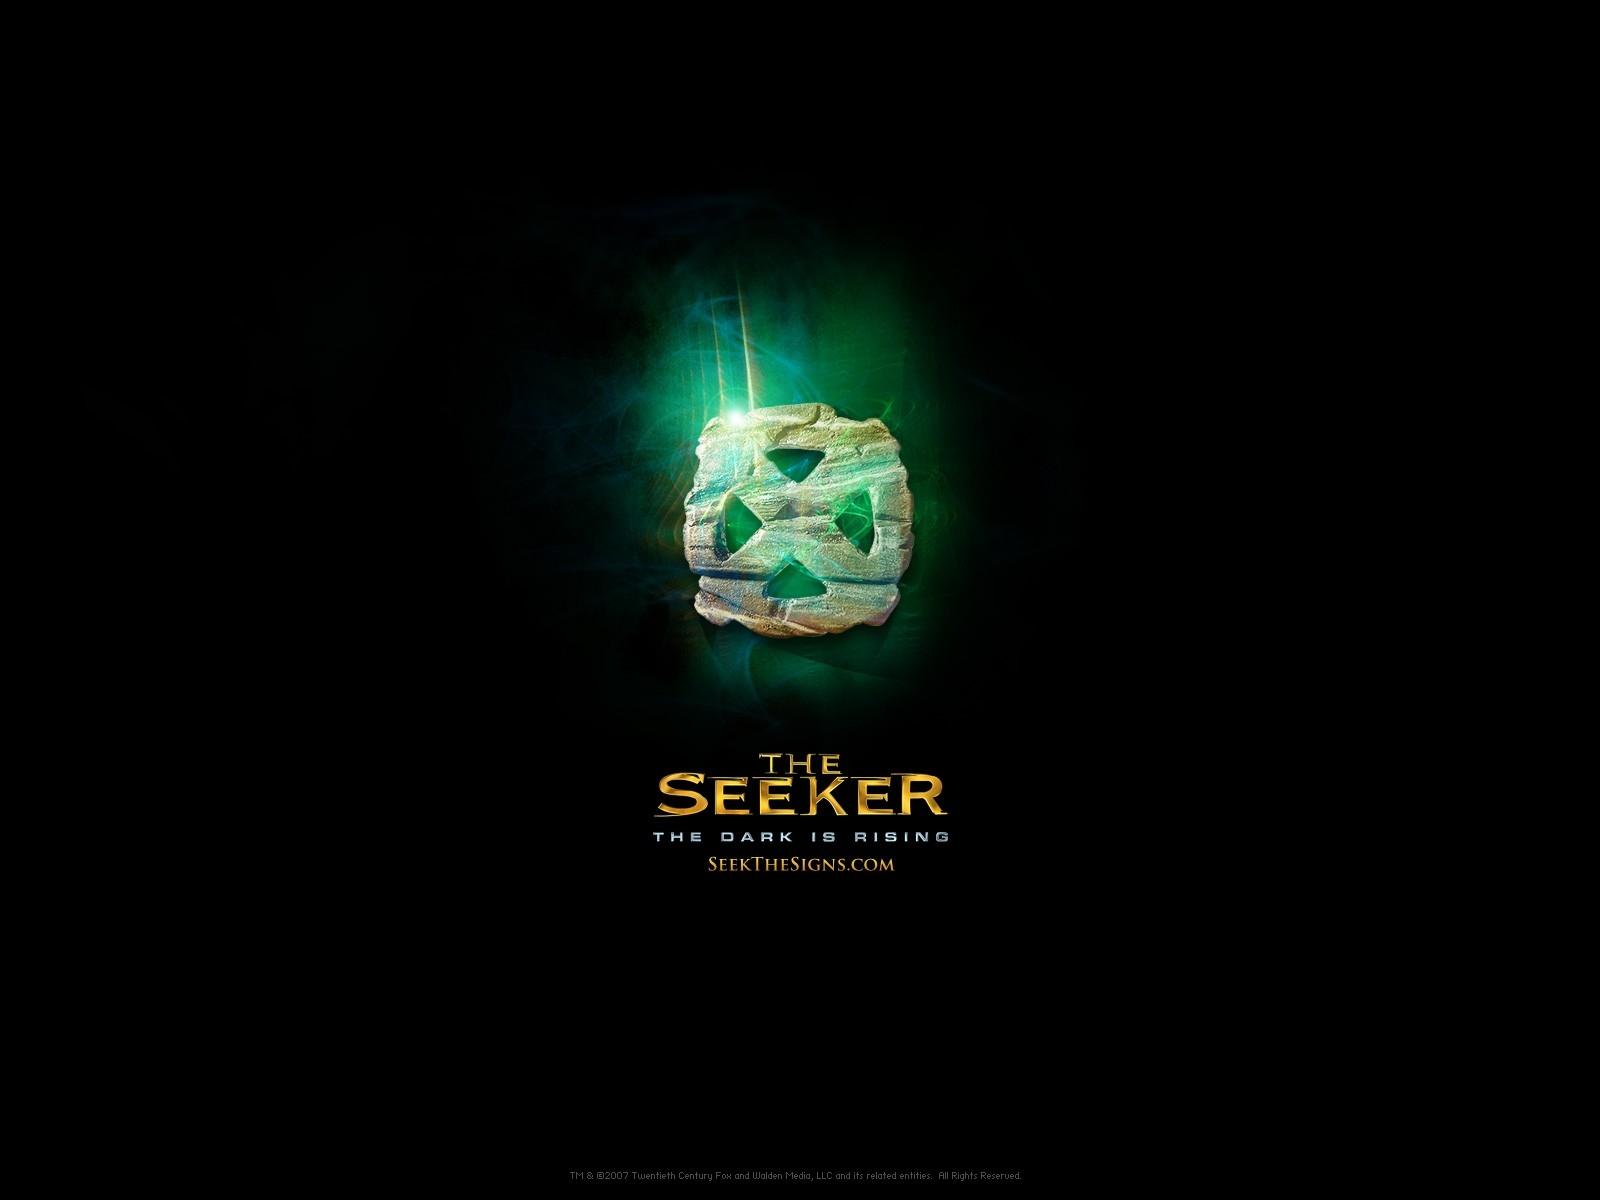 Wallpaper di The Seeker: The Dark Is Rising